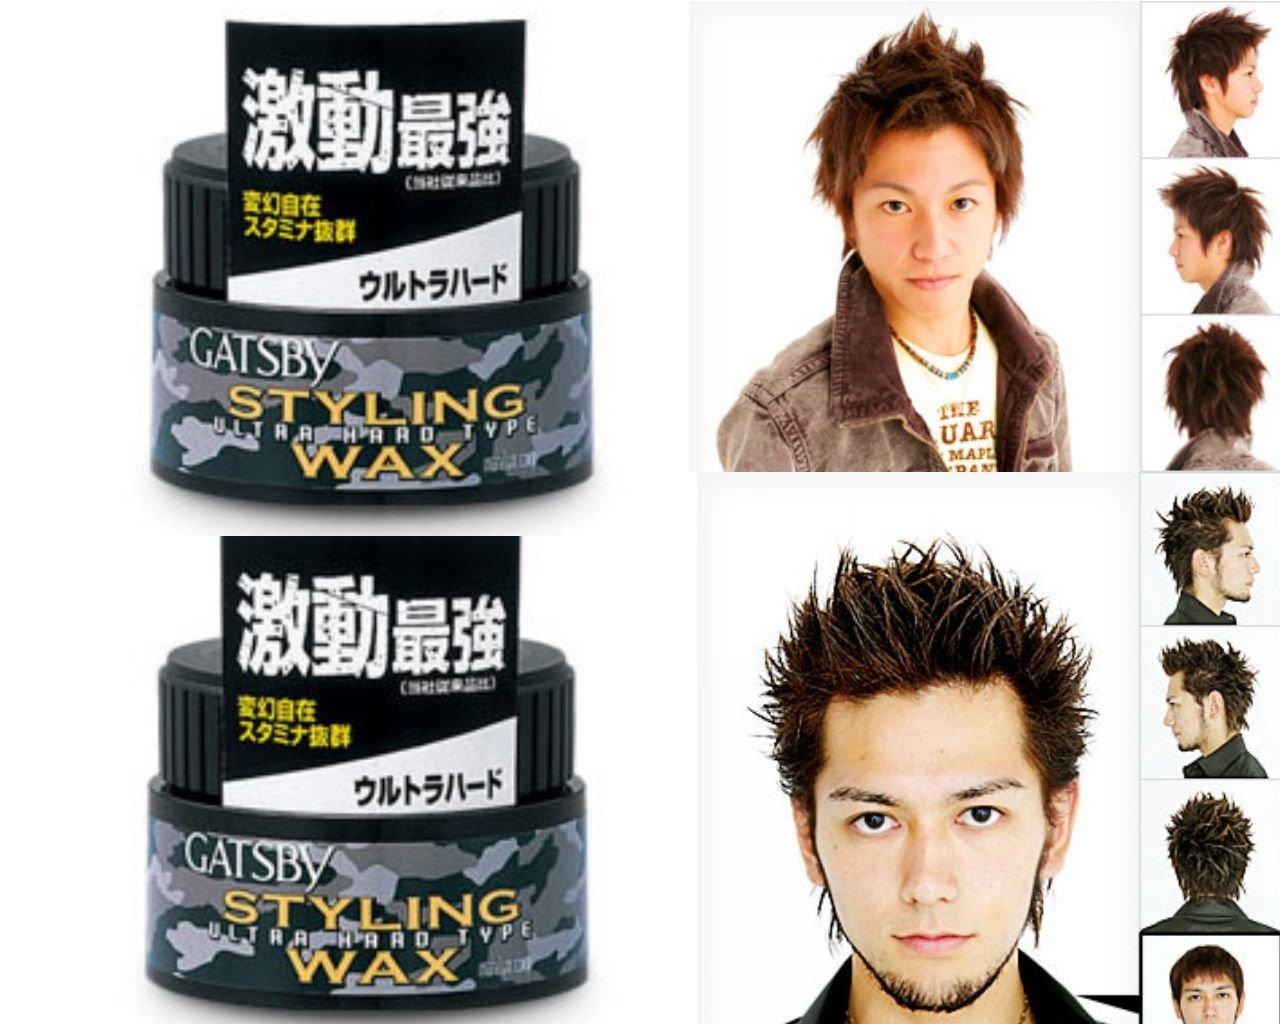 2PCs Lot Japan Gatsby Hair Styling Strongest Series - Ultra Hard Type Wax 80g Free Shipping